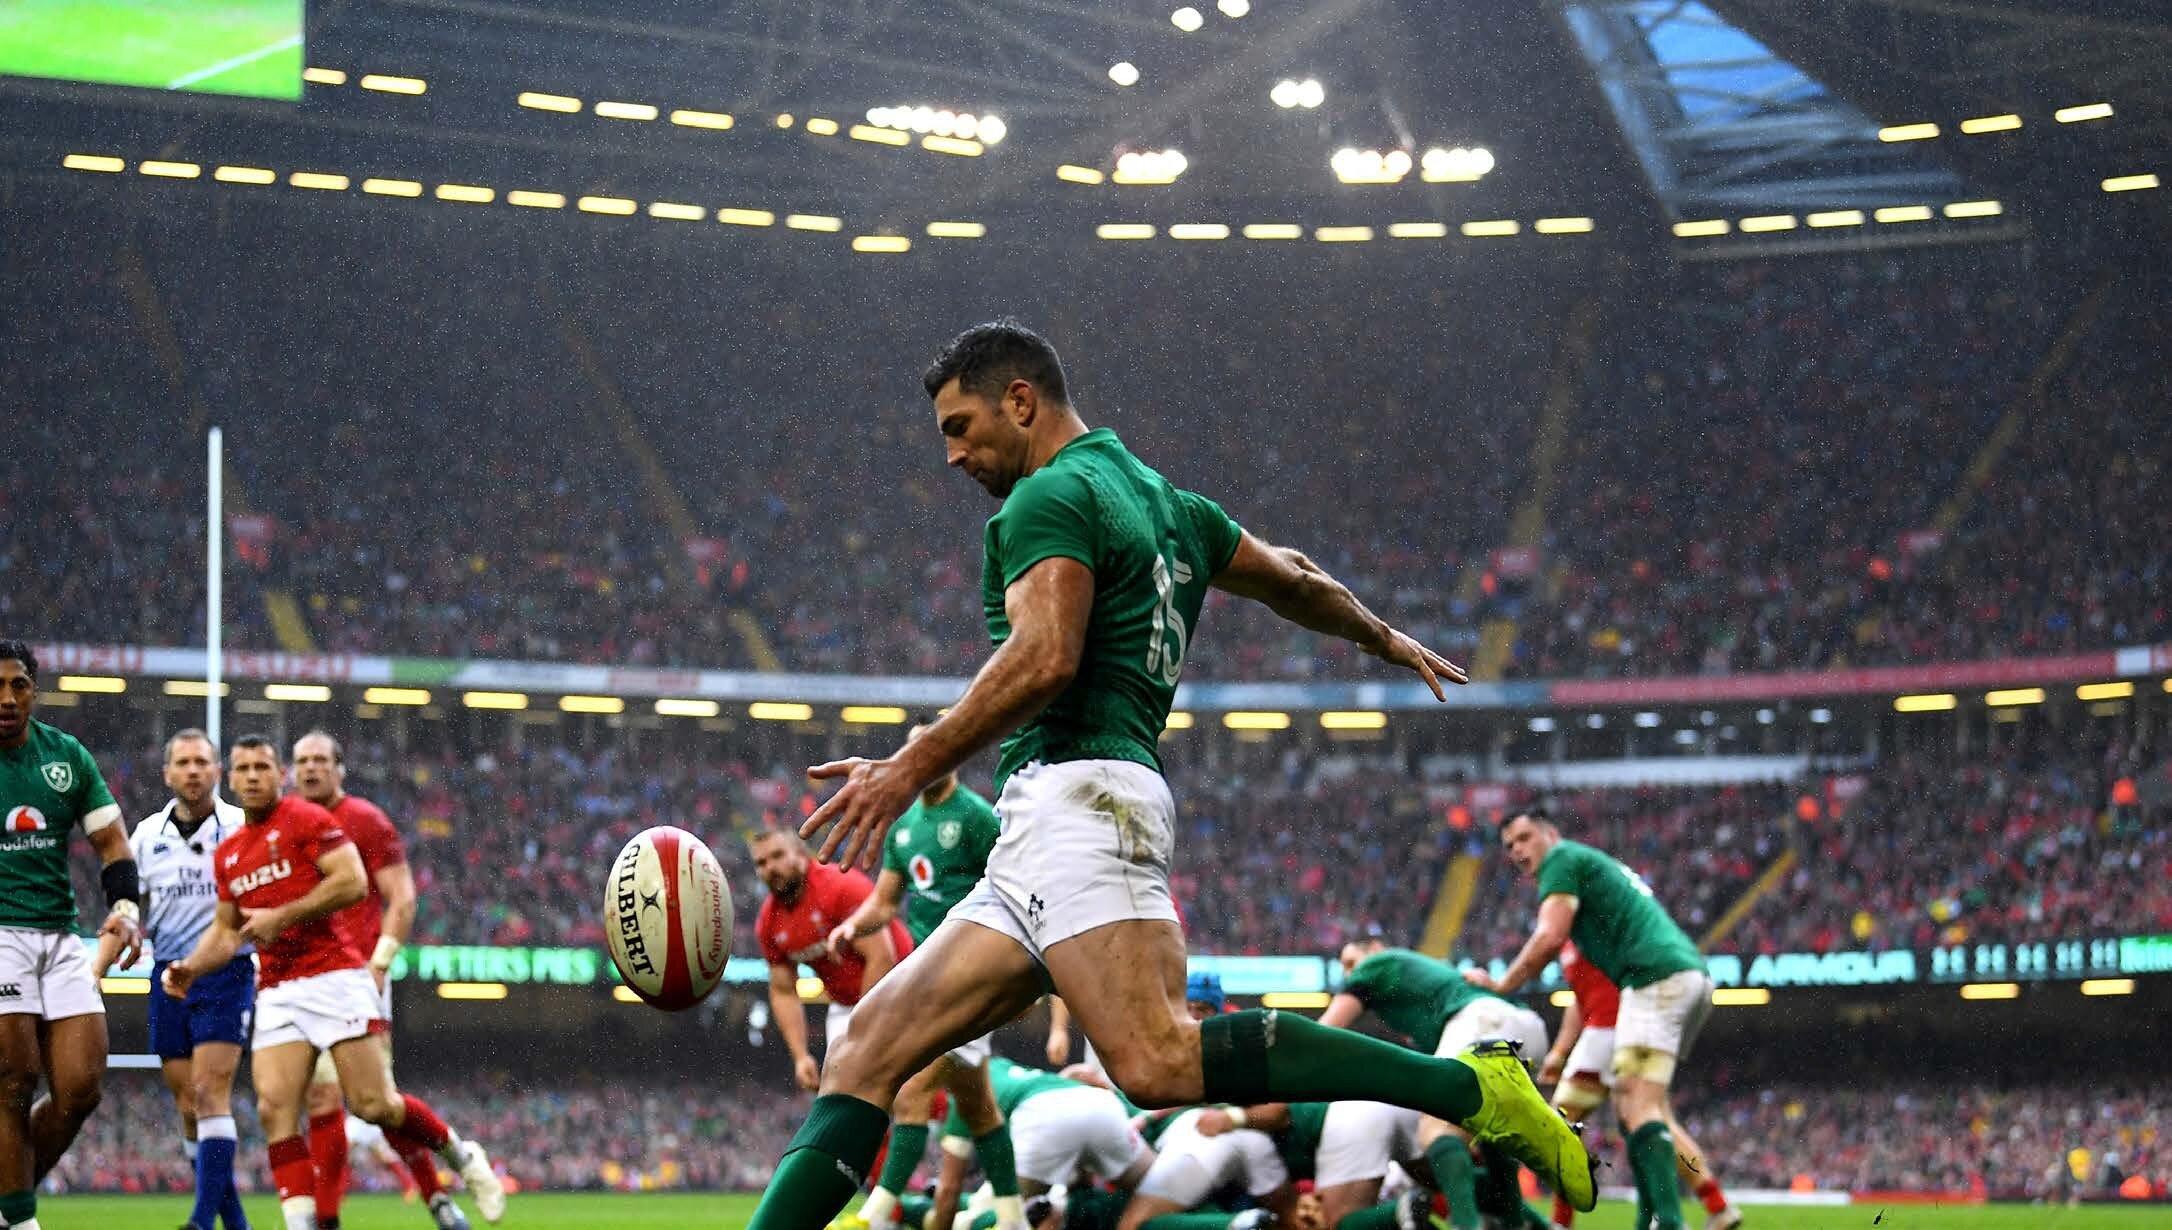 Ireland vs Wales - Guinness Six Nations 2020 - Aviva Stadium, DublinSaturday 8th February 2020